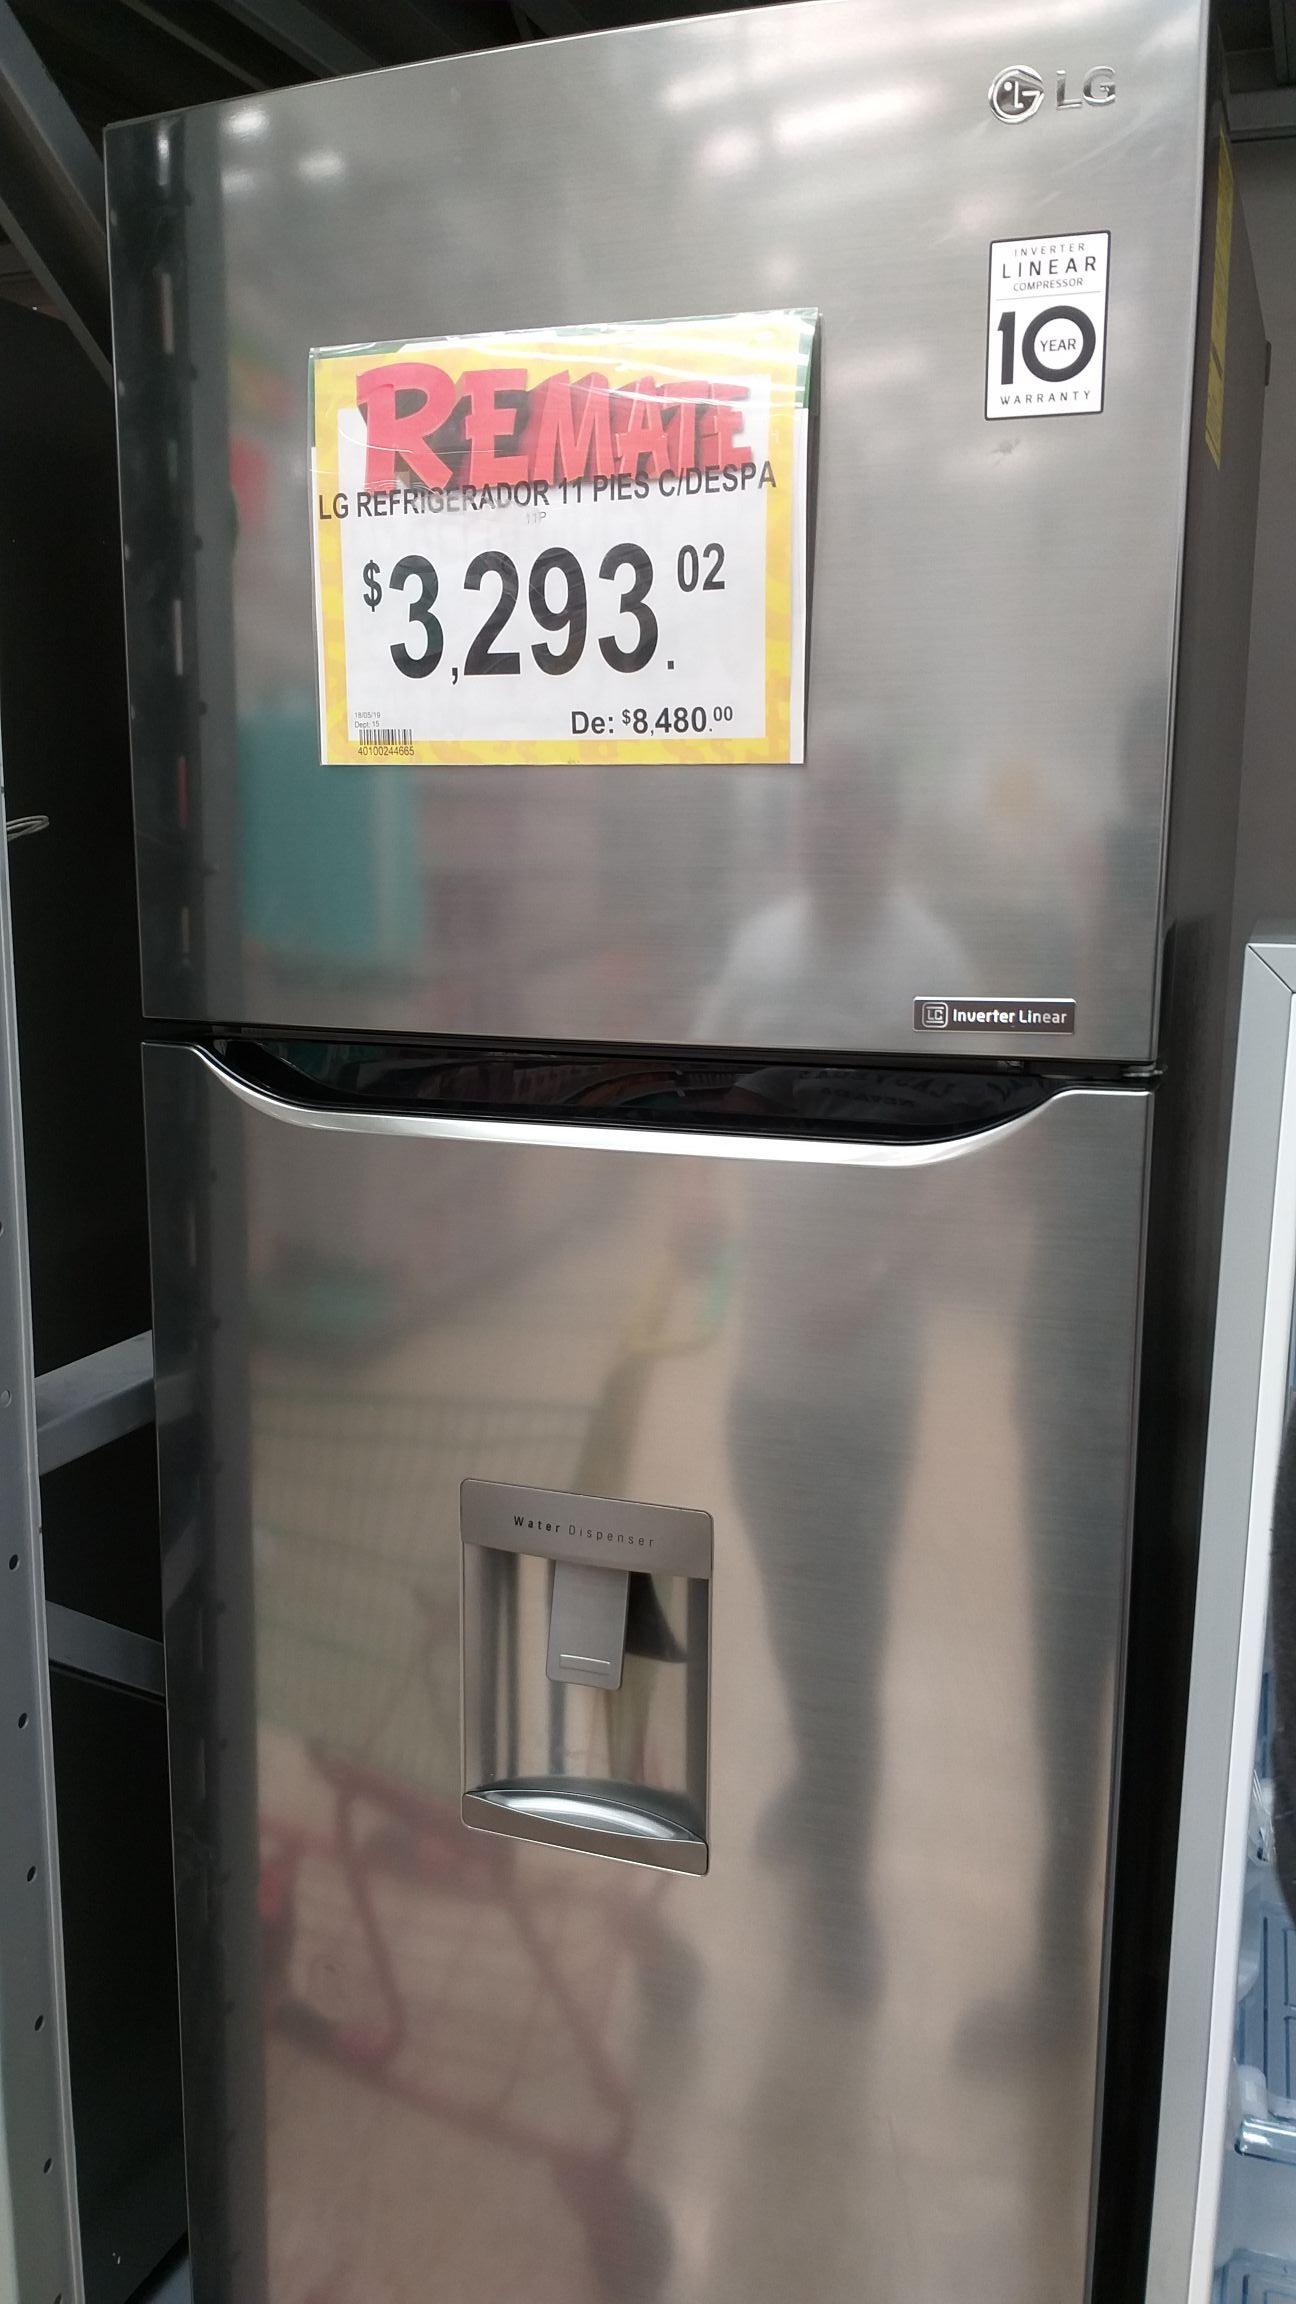 Bodega Aurrera: Refrigerador LG con despachador de Agua